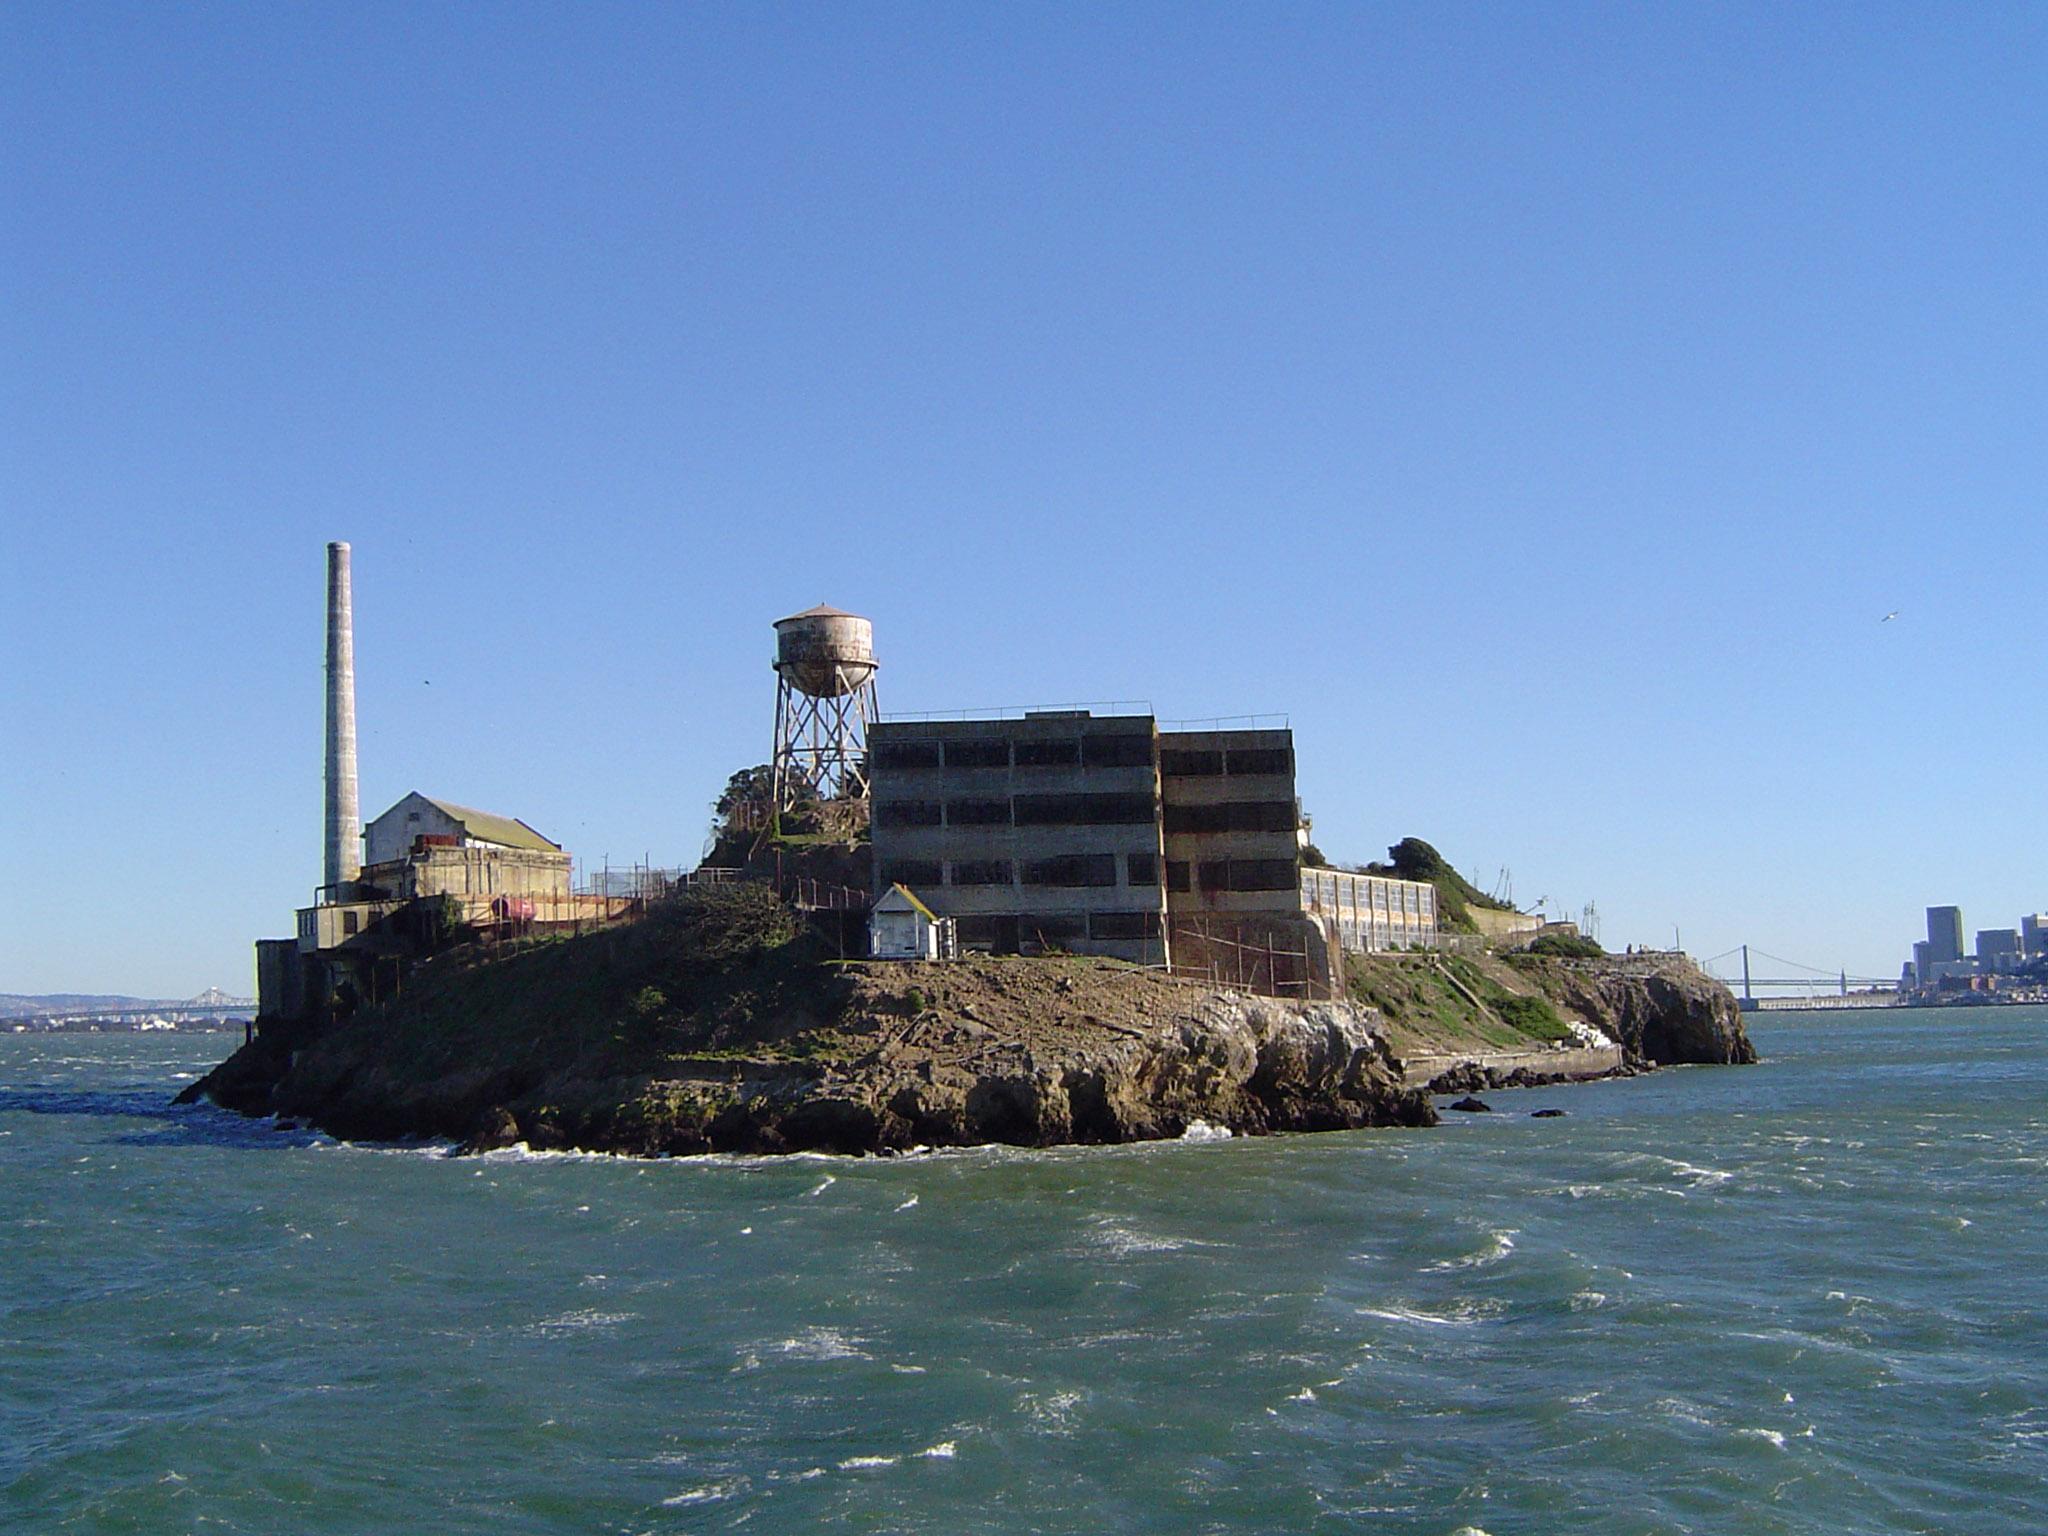 free stock photo 952-alcatraz_island_01959 | freeimageslive